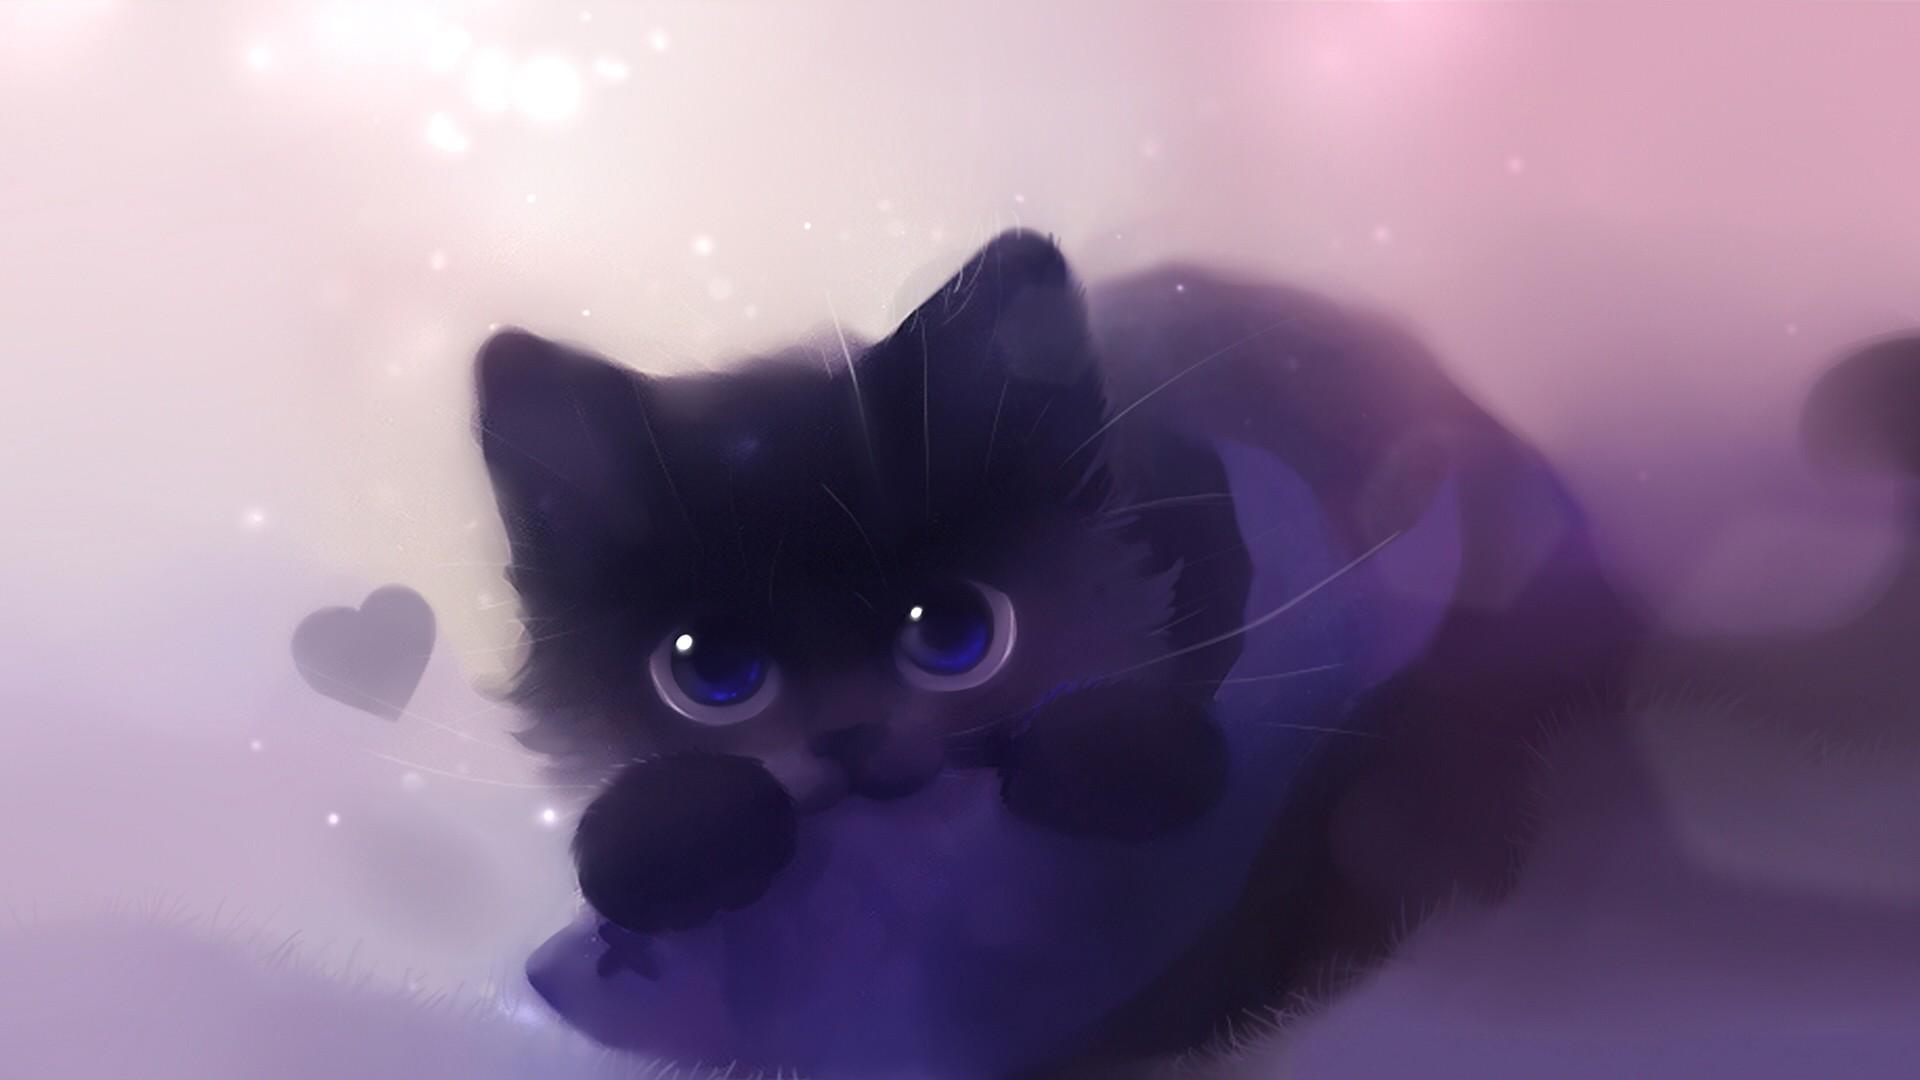 BLACK CAT, By Apofiss wallpaper – ForWallpaper.com